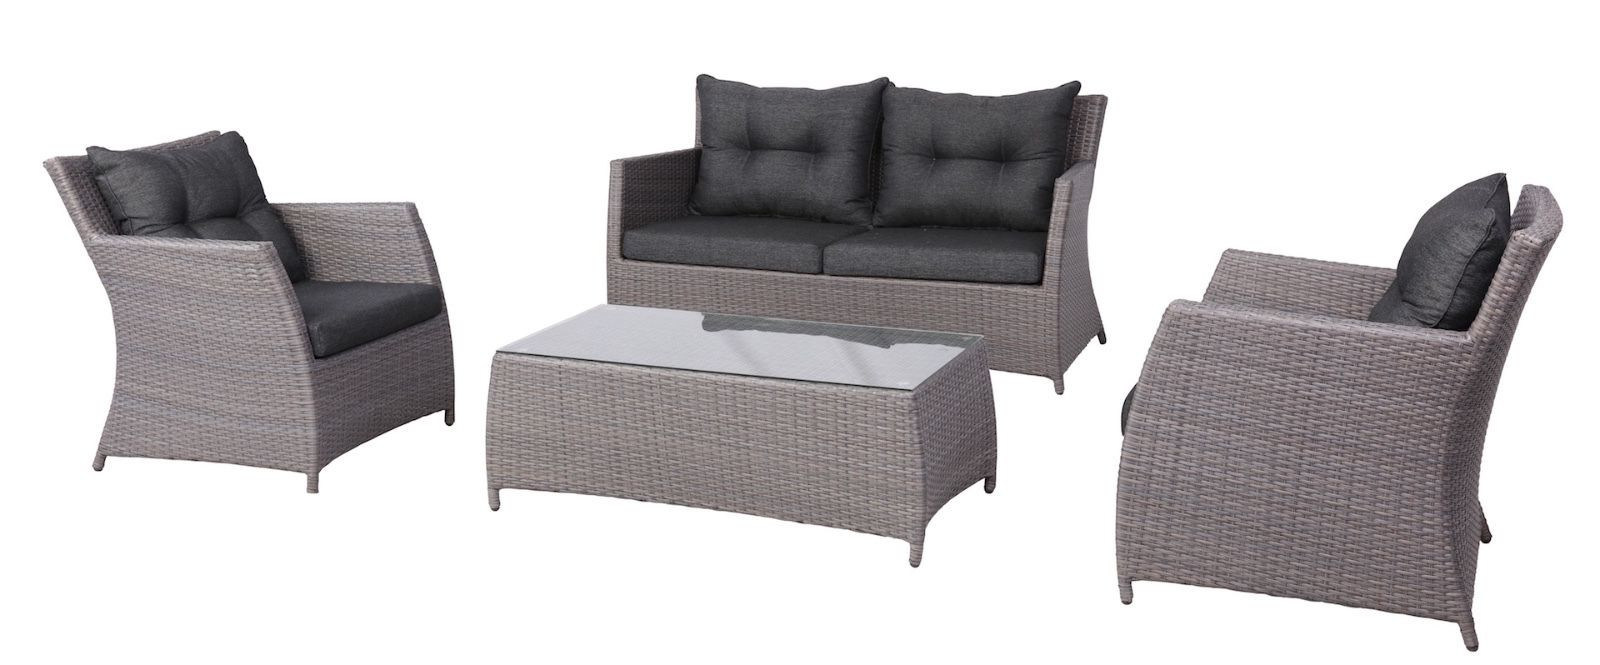 China 4pcs Delicate Wicker Outdoor Lounge Sofa Furniture Setting Garden Chairs Set